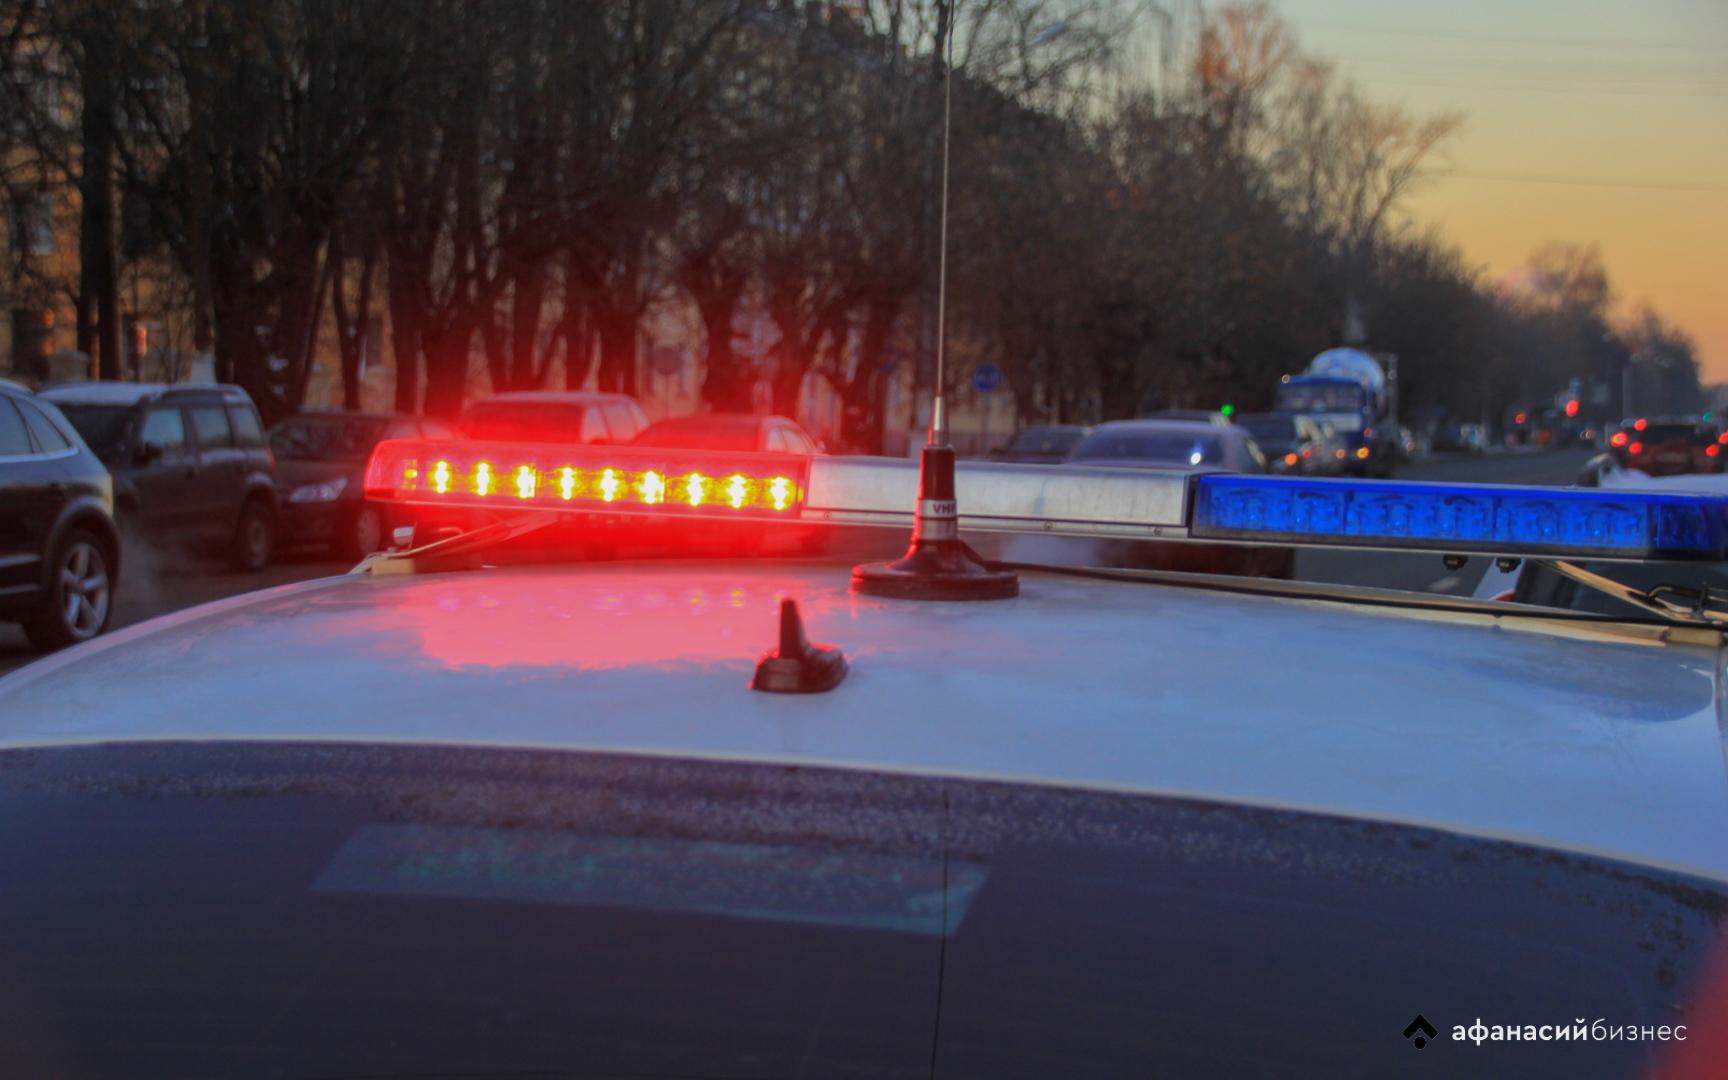 В Тверской области Kia после столкновения с Mazda сбила на «зебре» пешехода